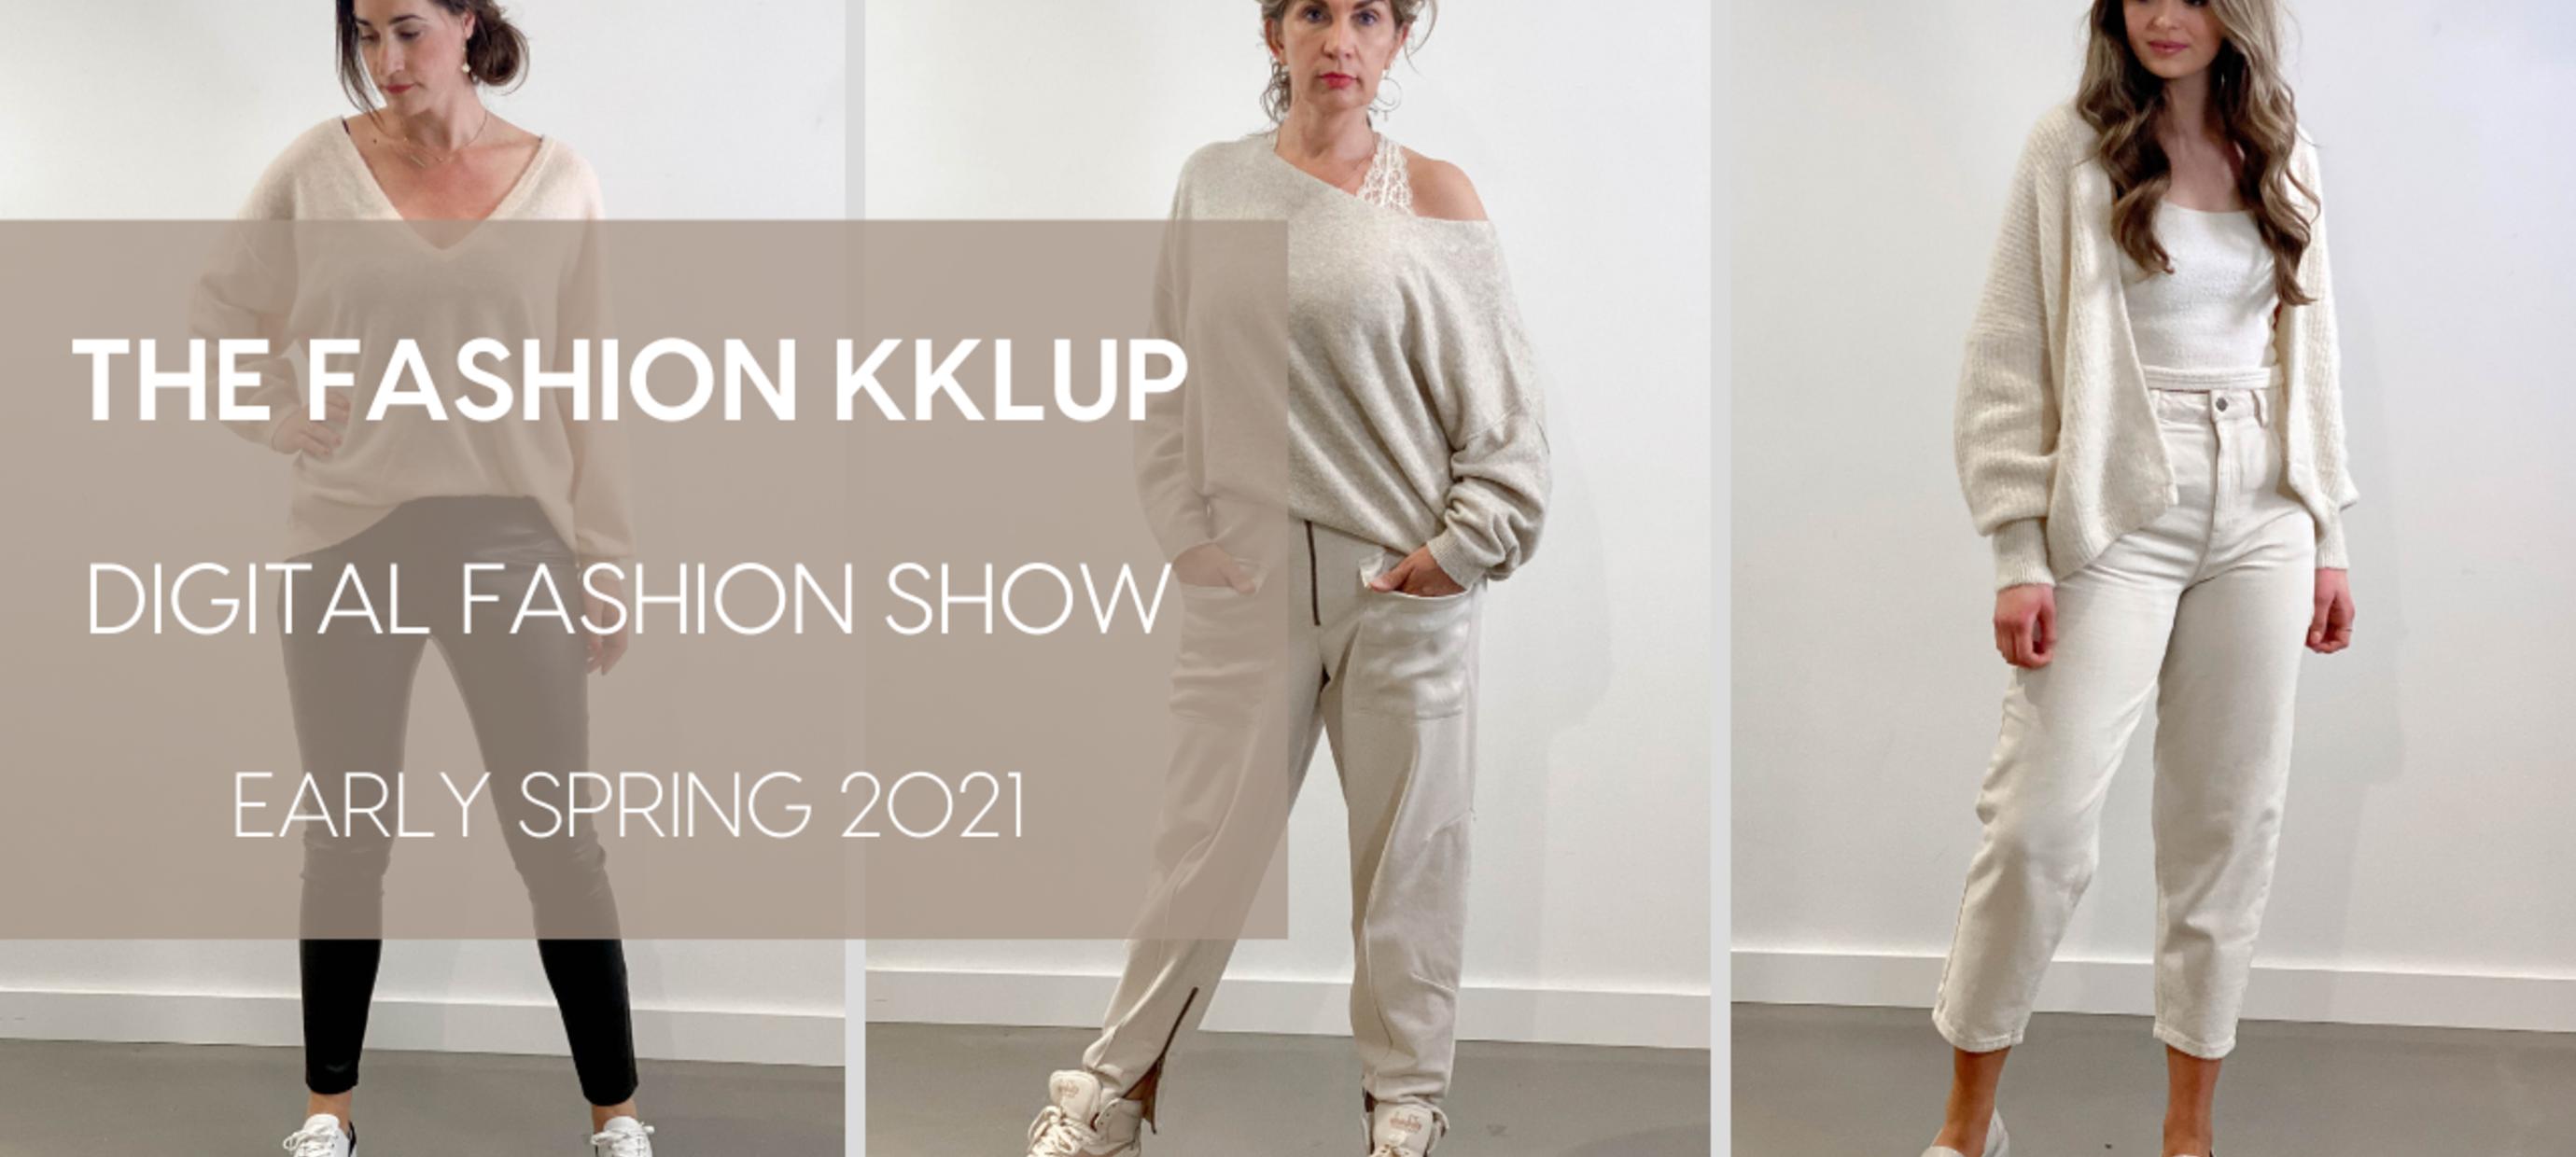 THE FASHION KKLUP | DIGITAL FASHION SHOW | EARLY SPRING 2021